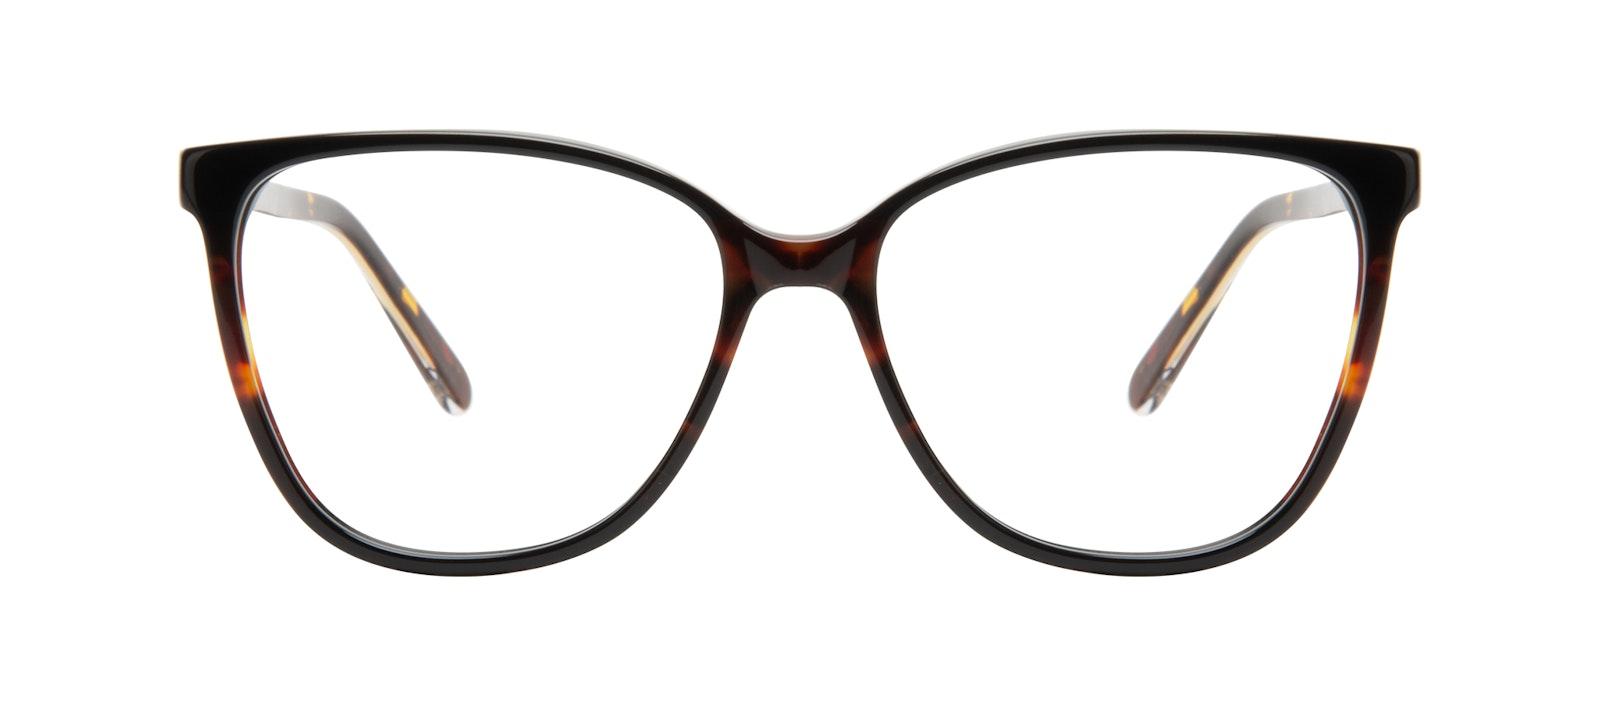 Affordable Fashion Glasses Square Eyeglasses Women Flora Tundra Front